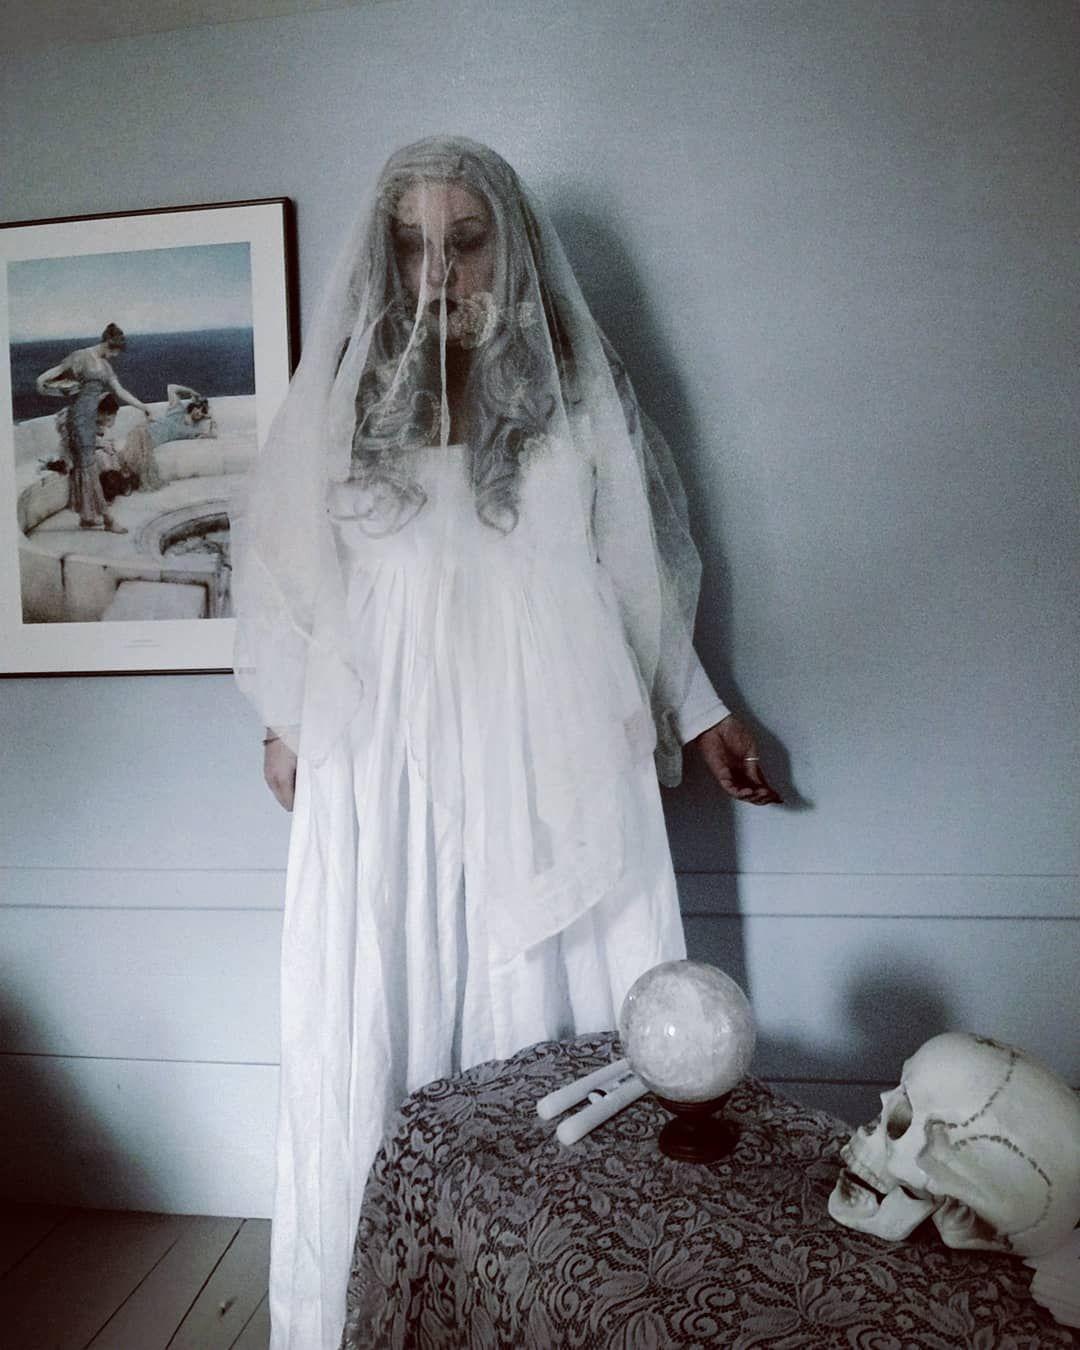 Gespenst Kostüm Selber Machen Diy Anleitung Gespenst Kostüm